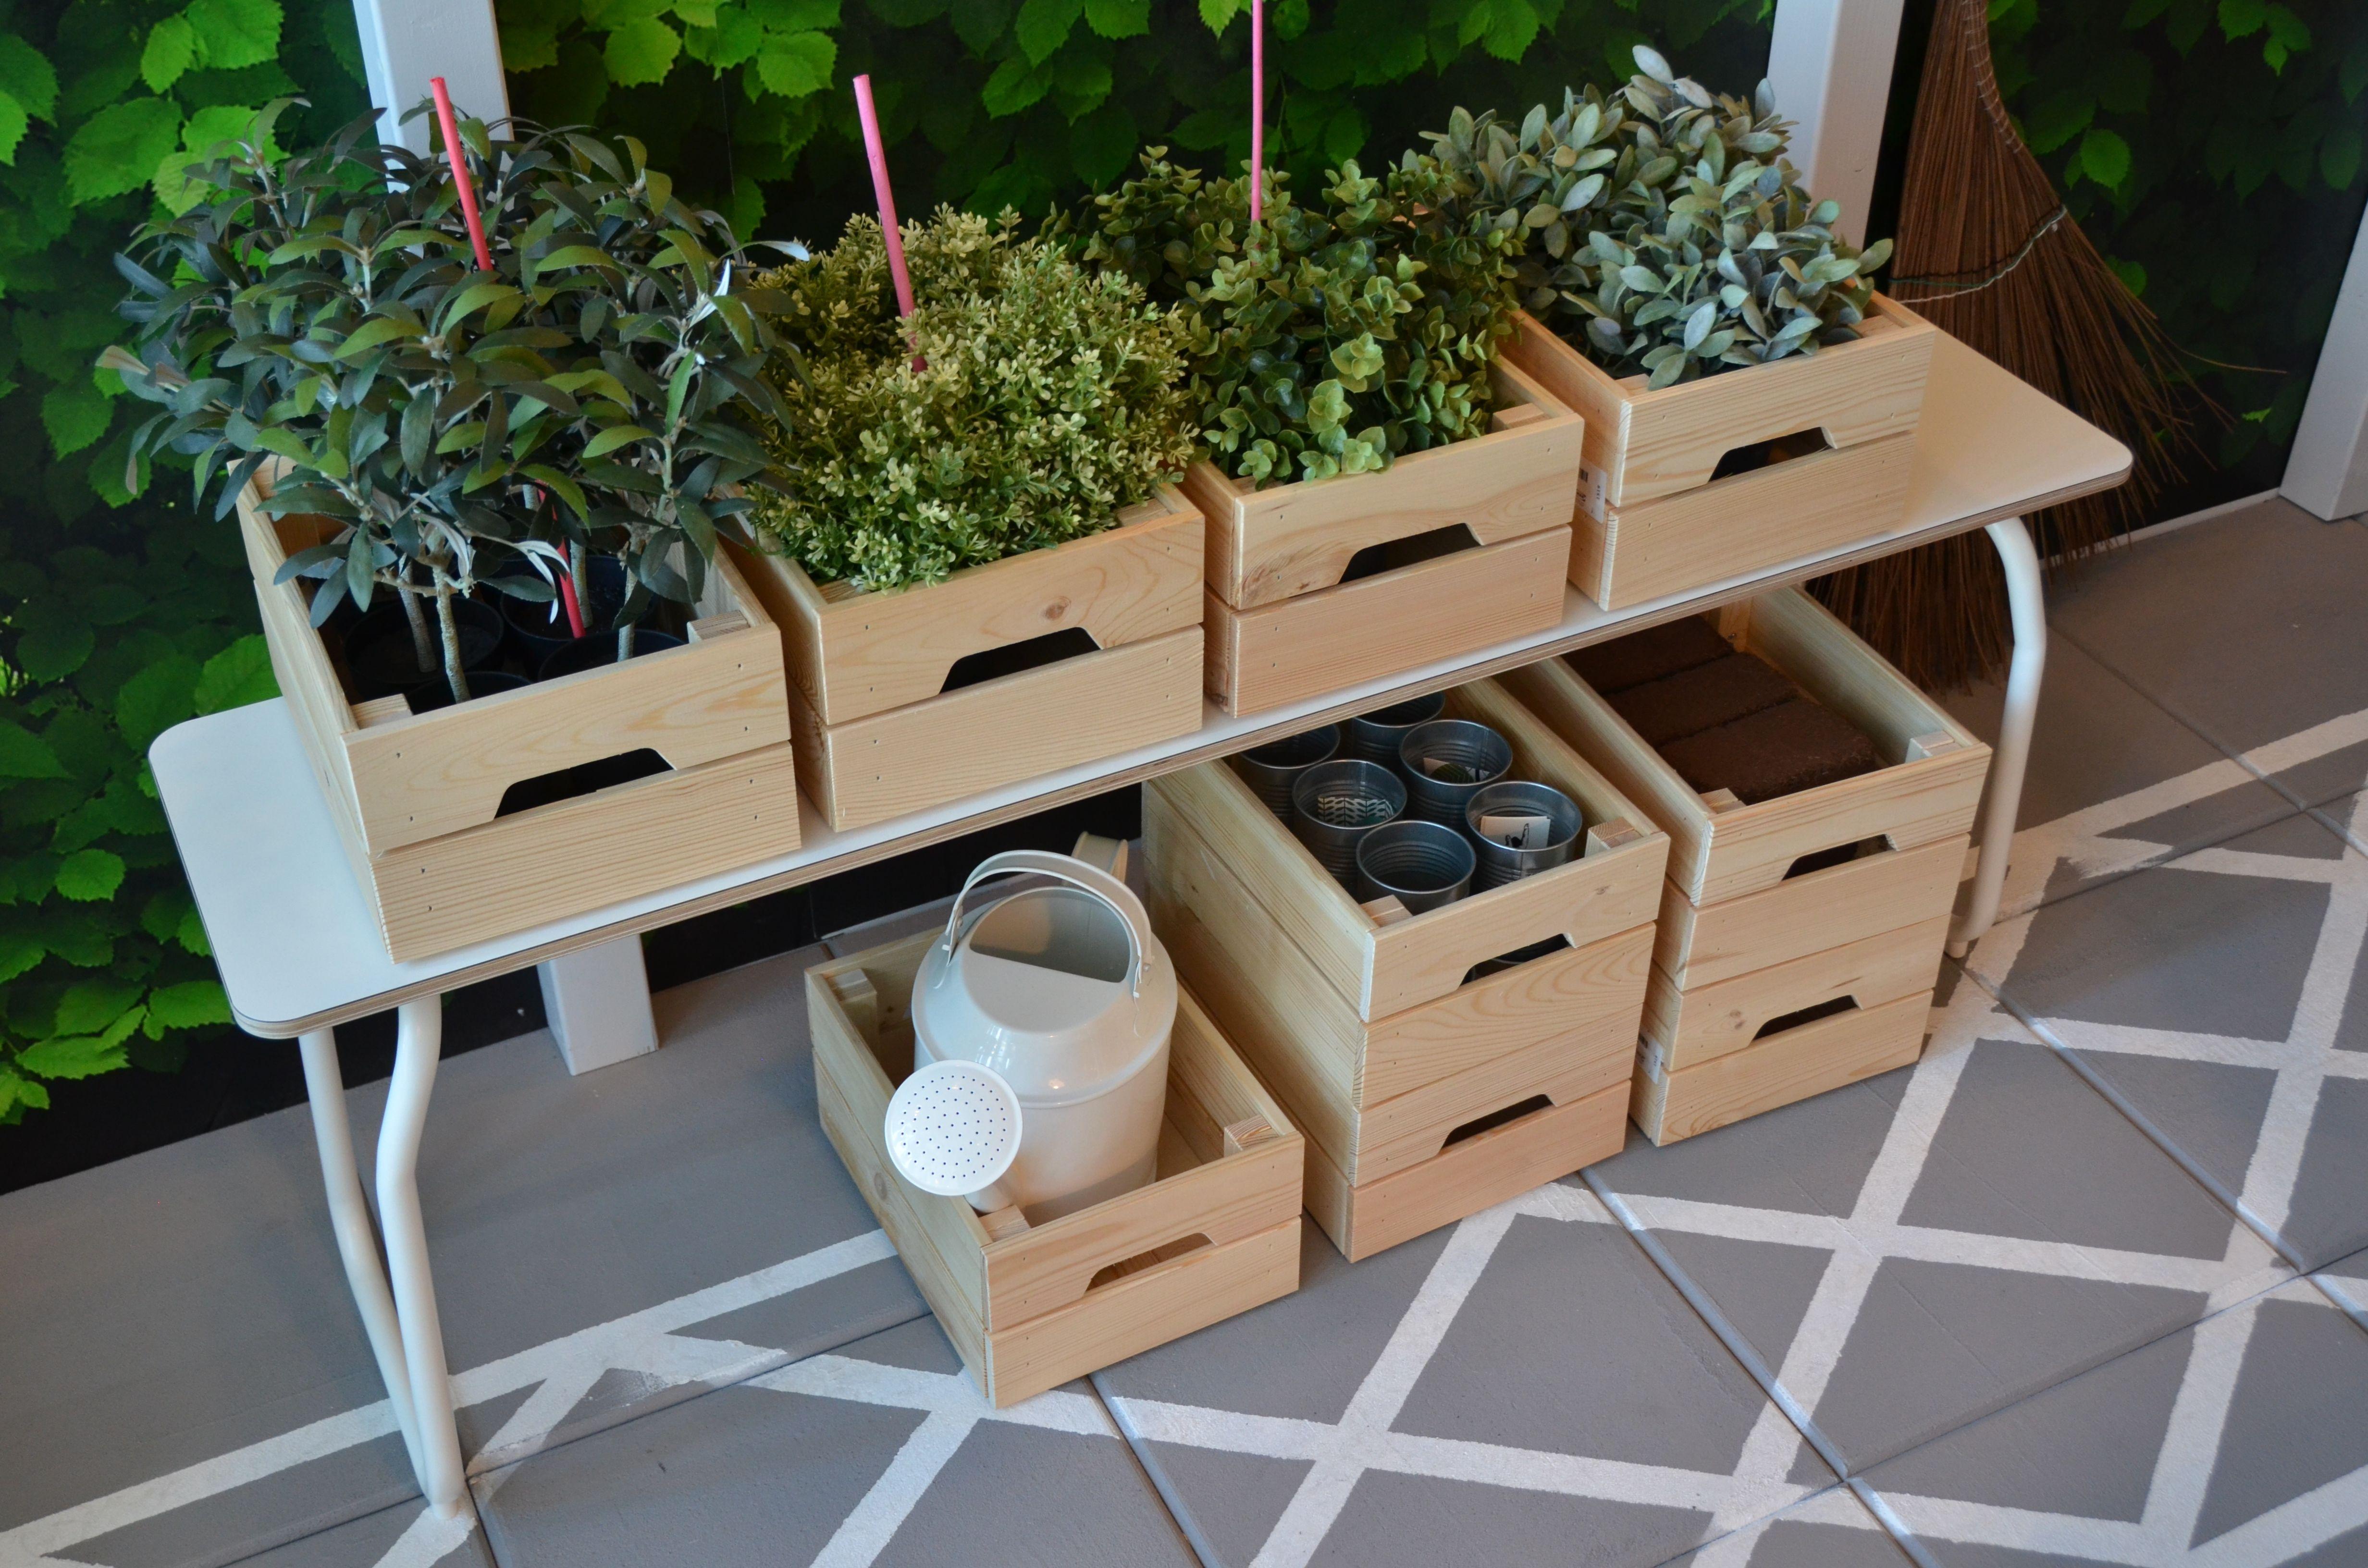 Ikea Küchenbrett ~ Ikea delft knagglig box ikea interior design master class